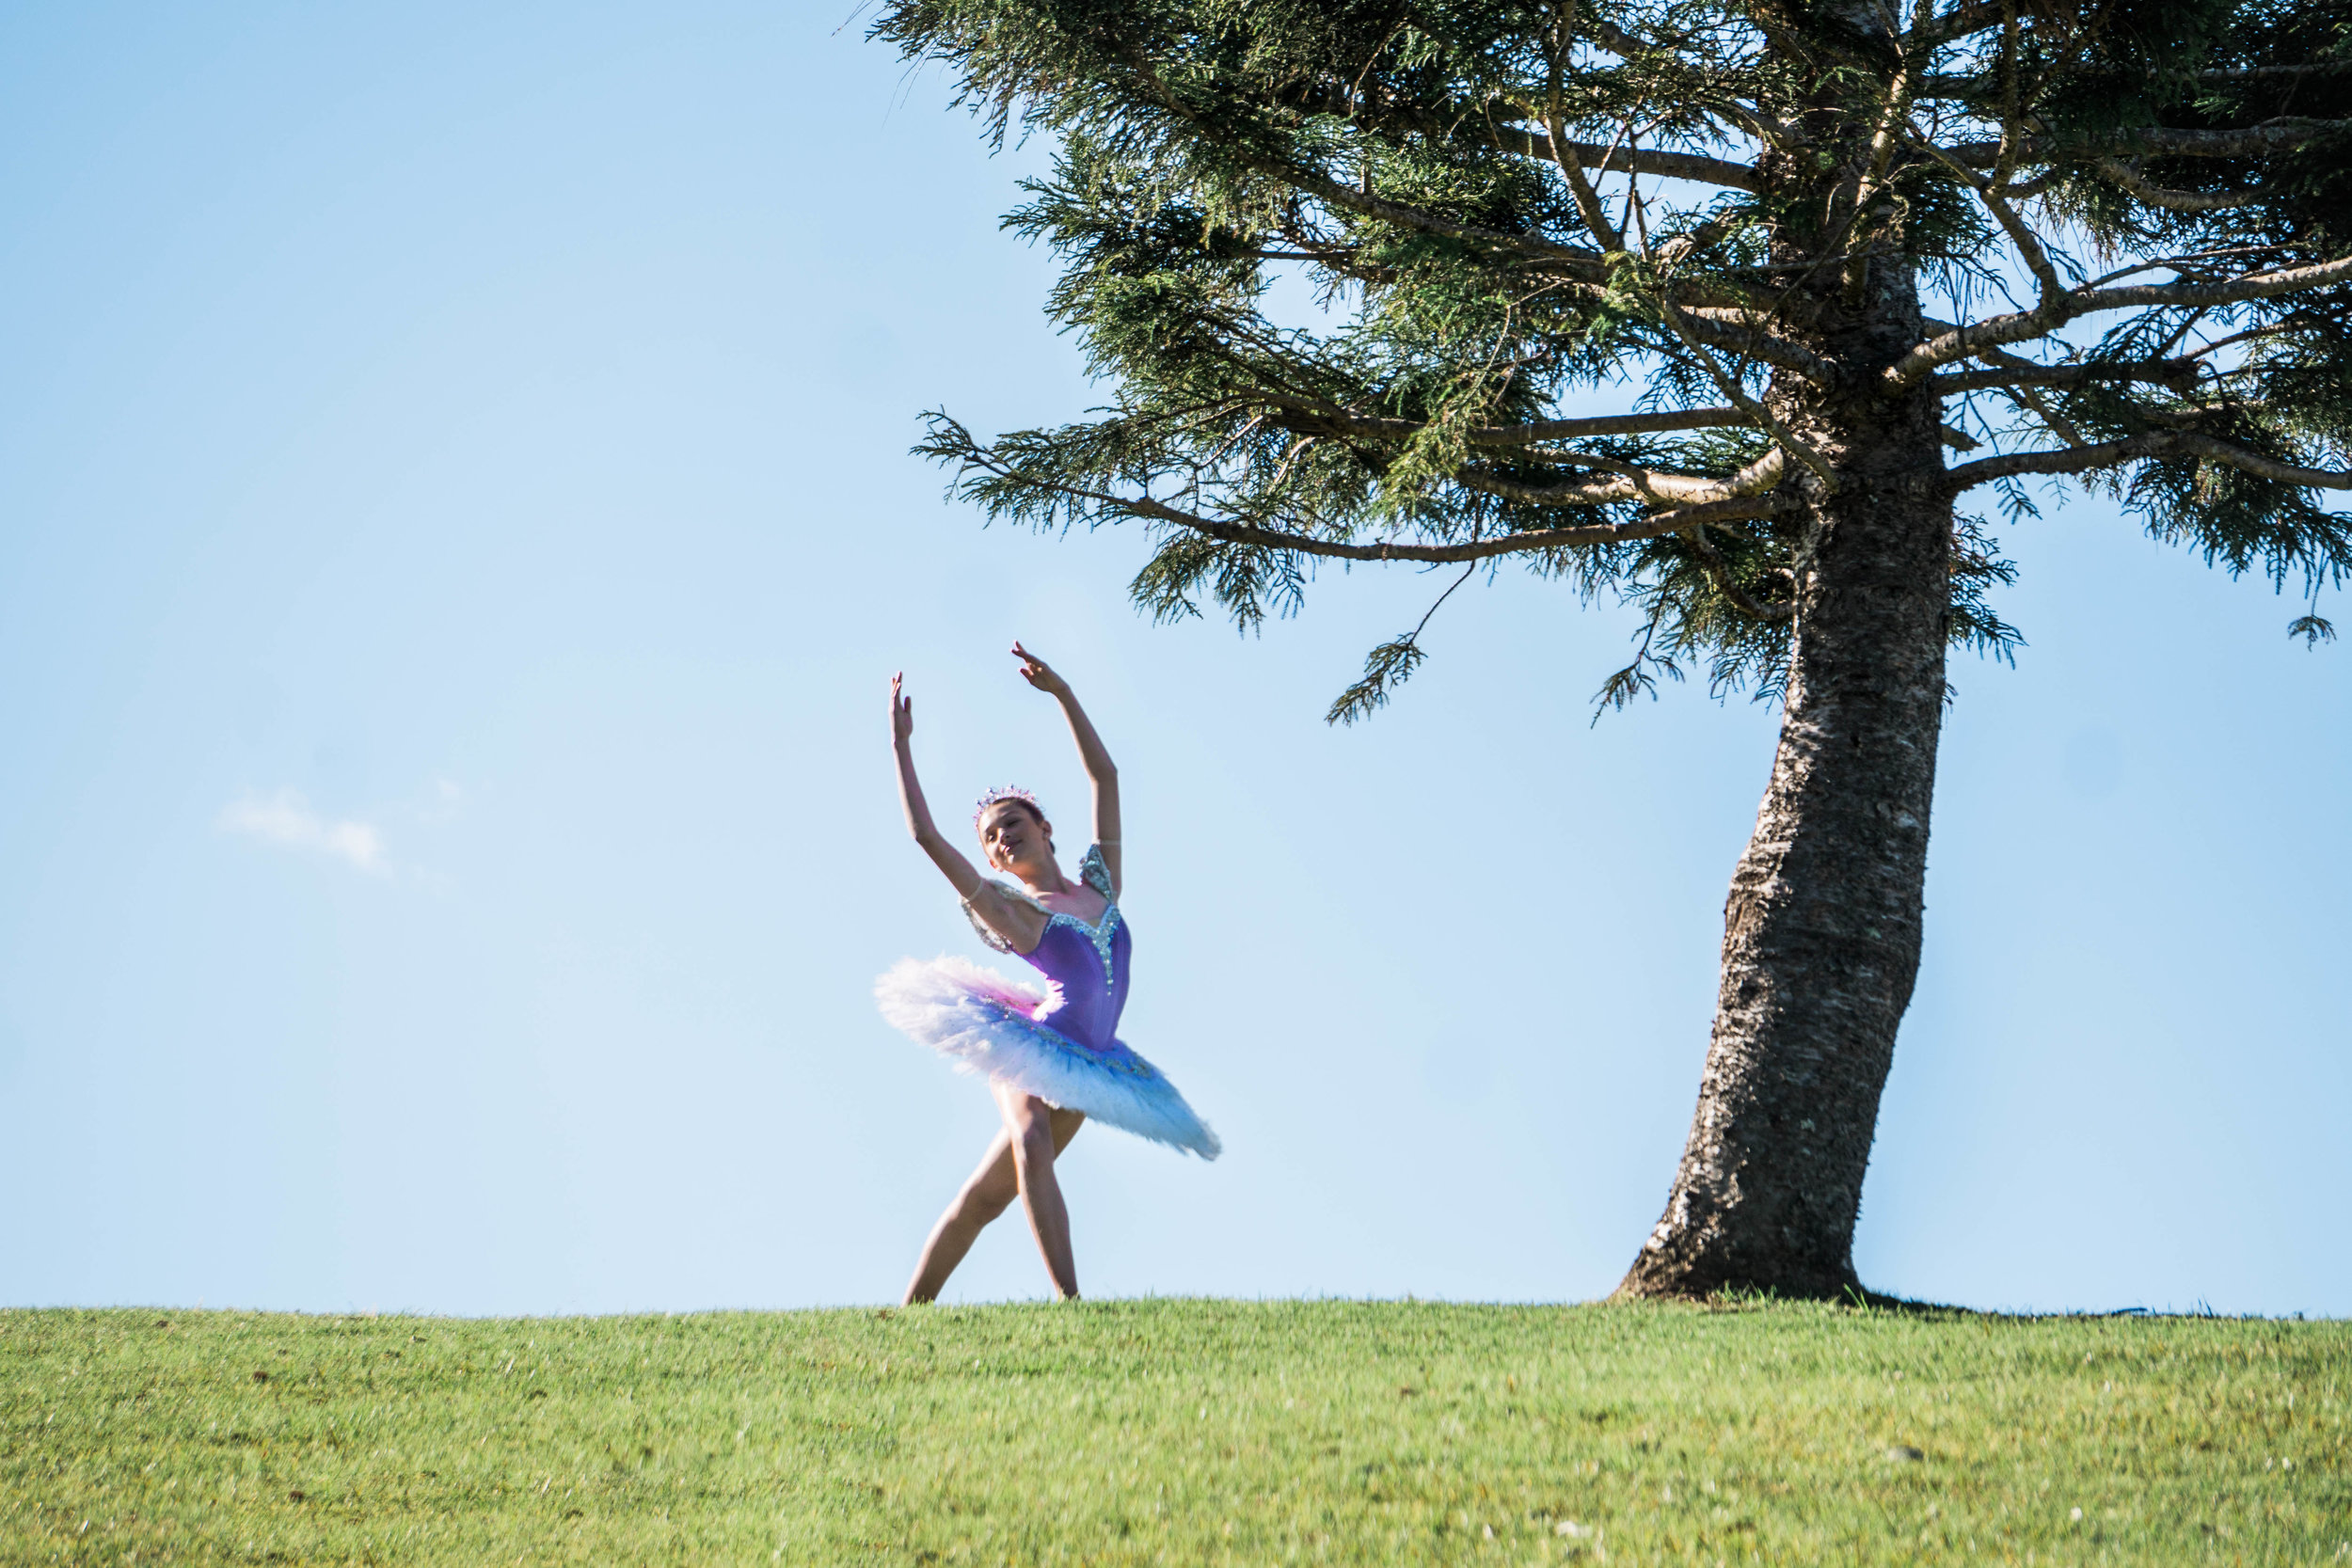 Hinterland-Dance-20.08.17-24.jpg